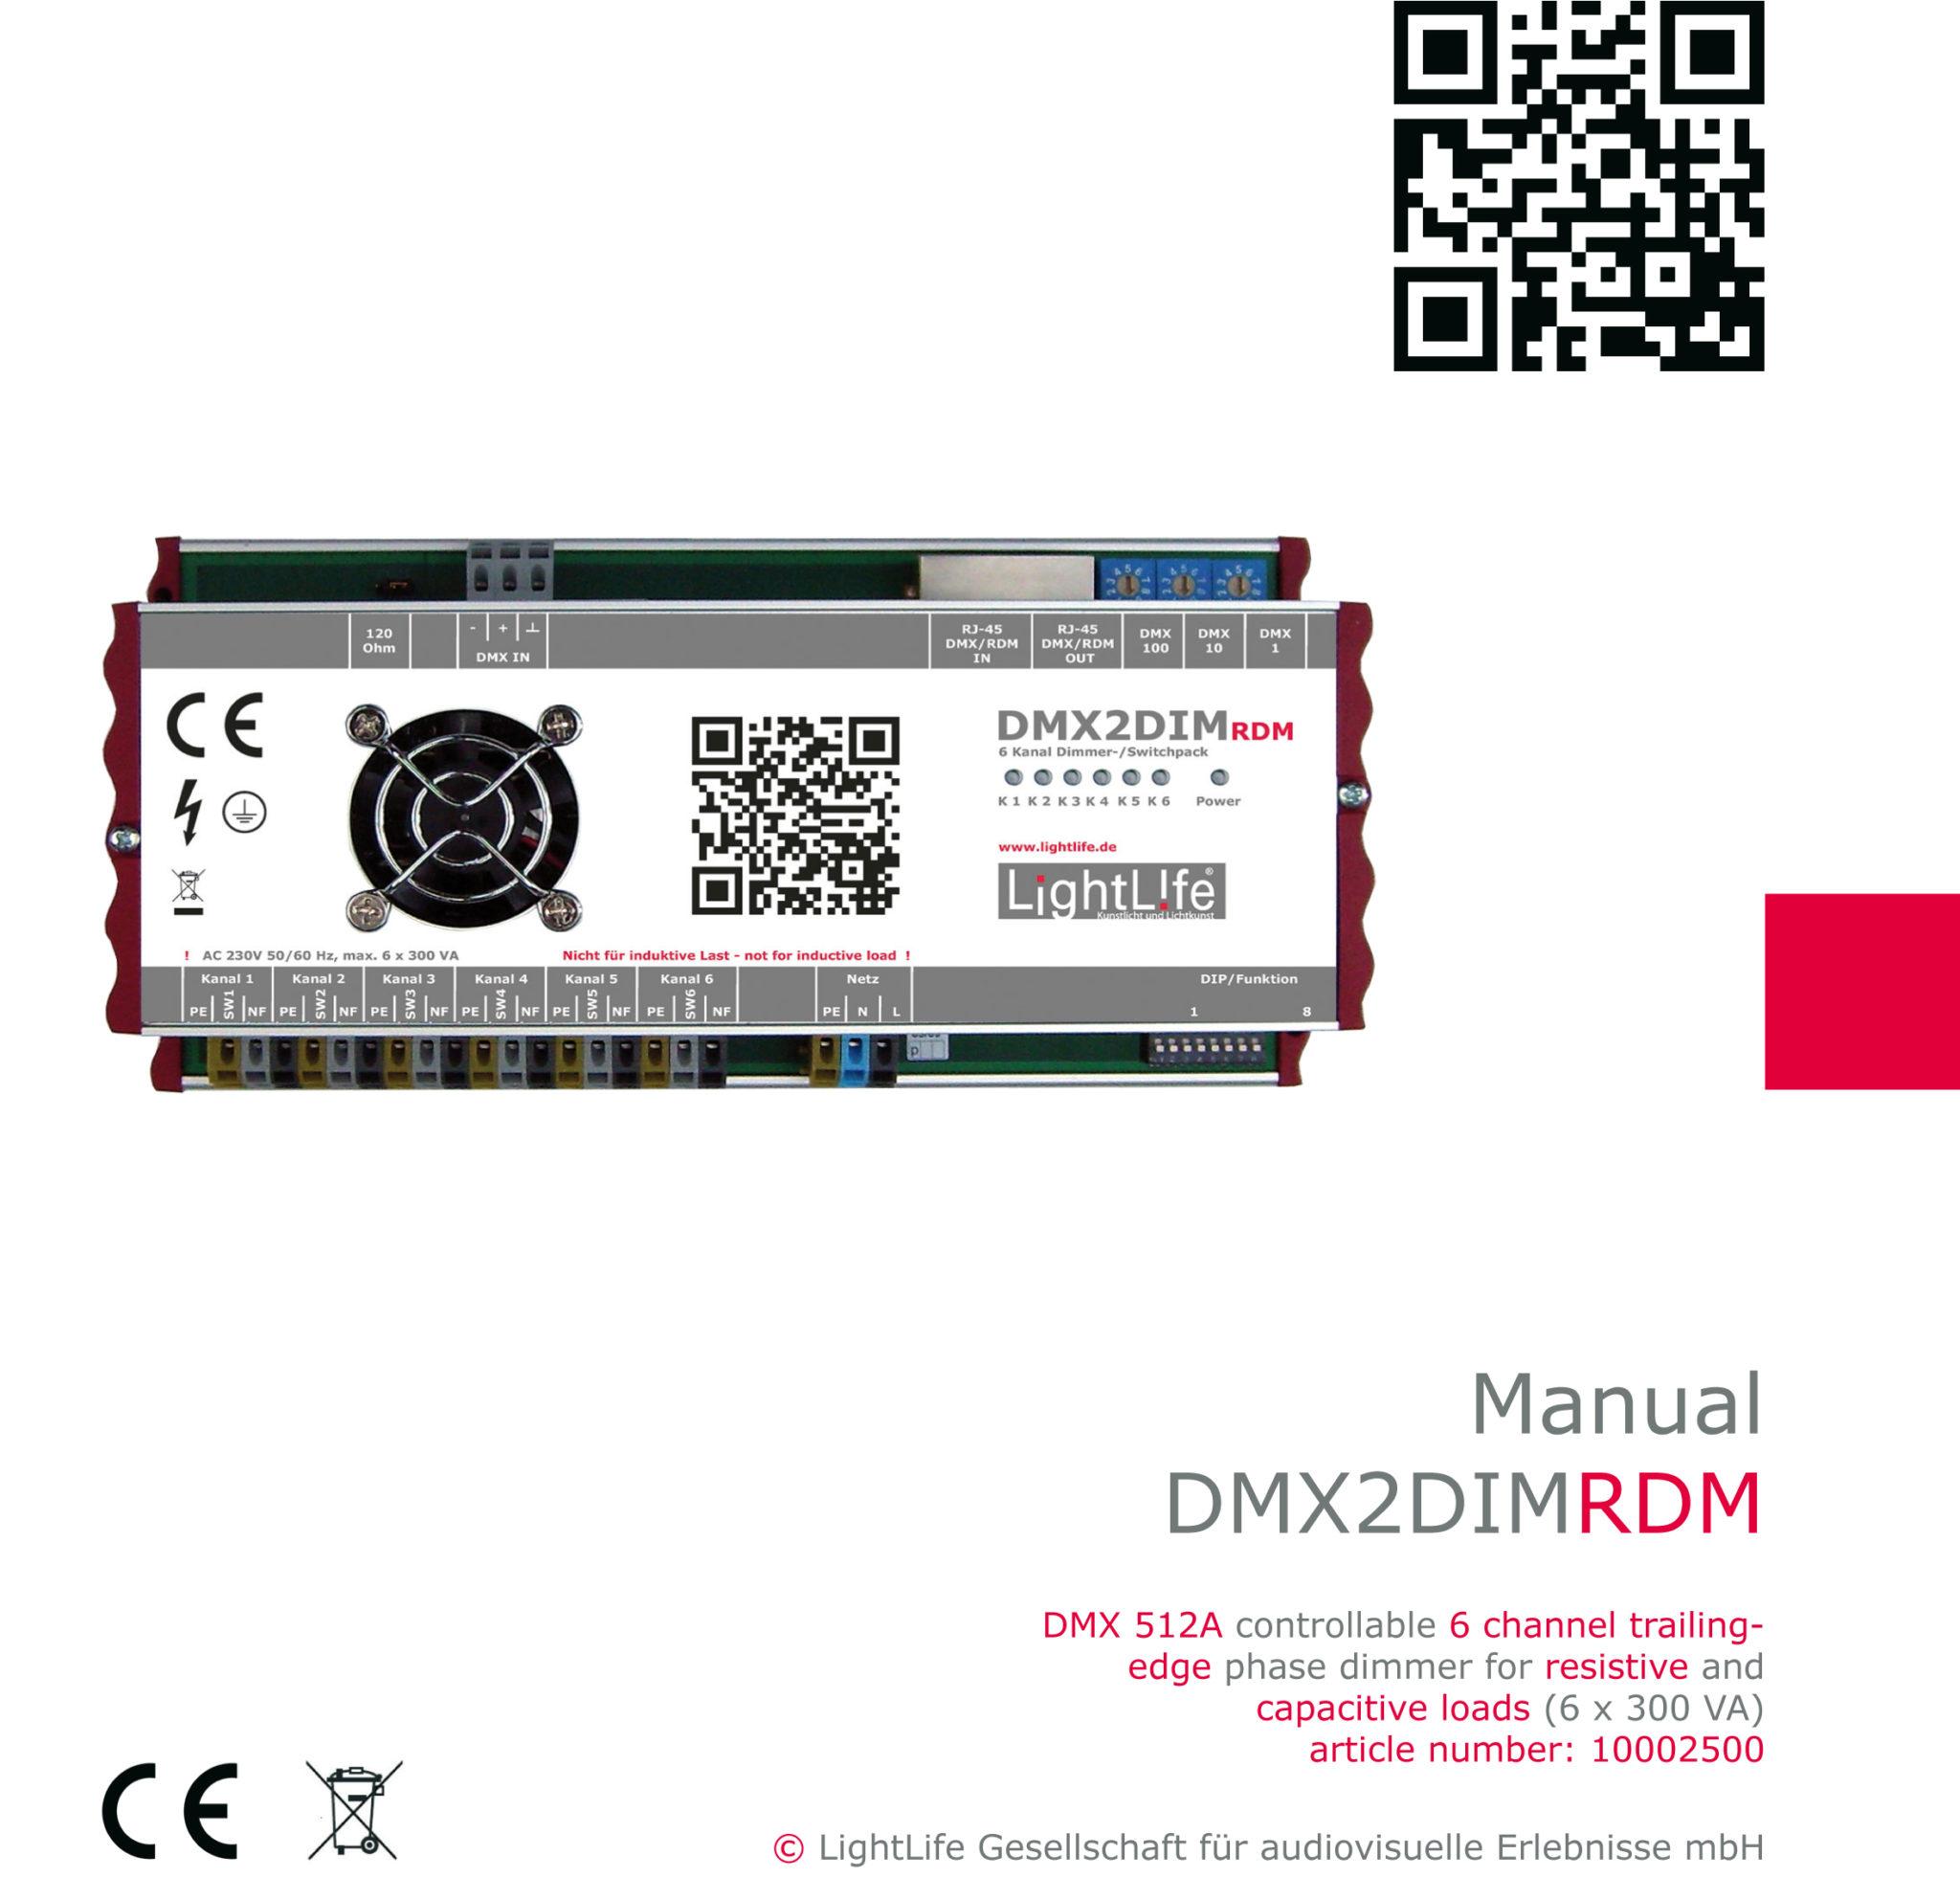 (Deutsch) Manual DMX2DIM-RDM